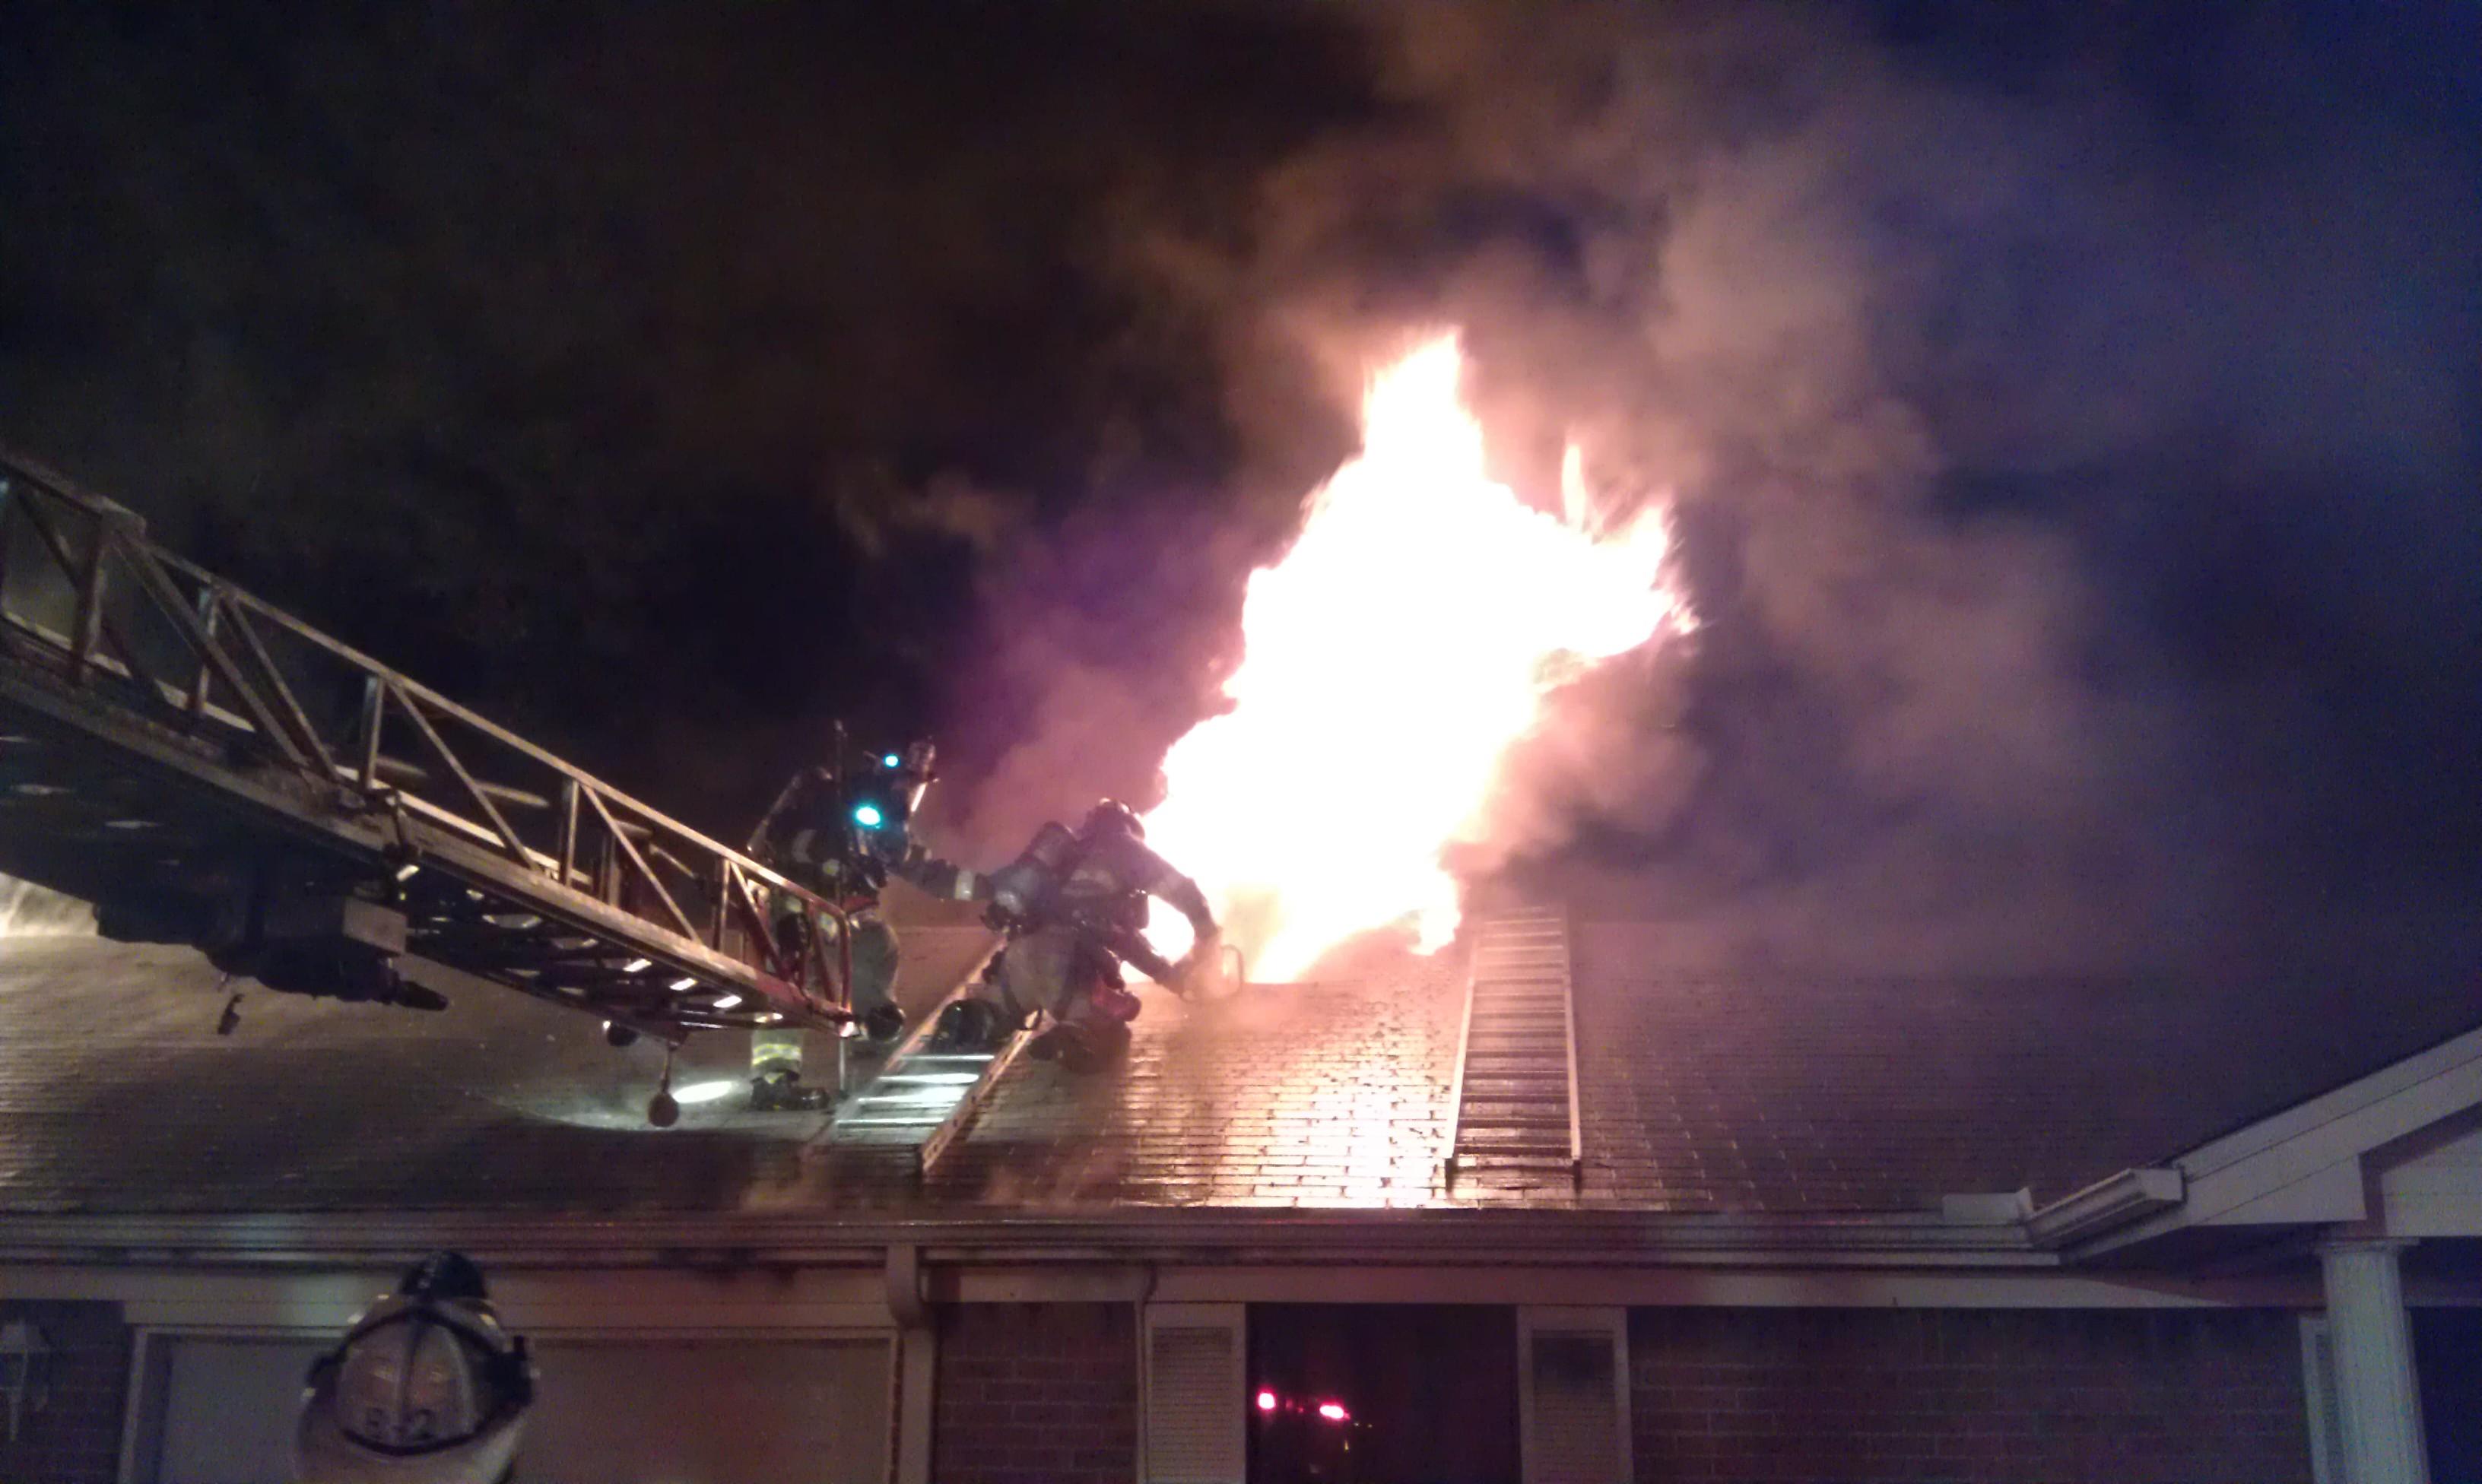 Fire Scene Photos